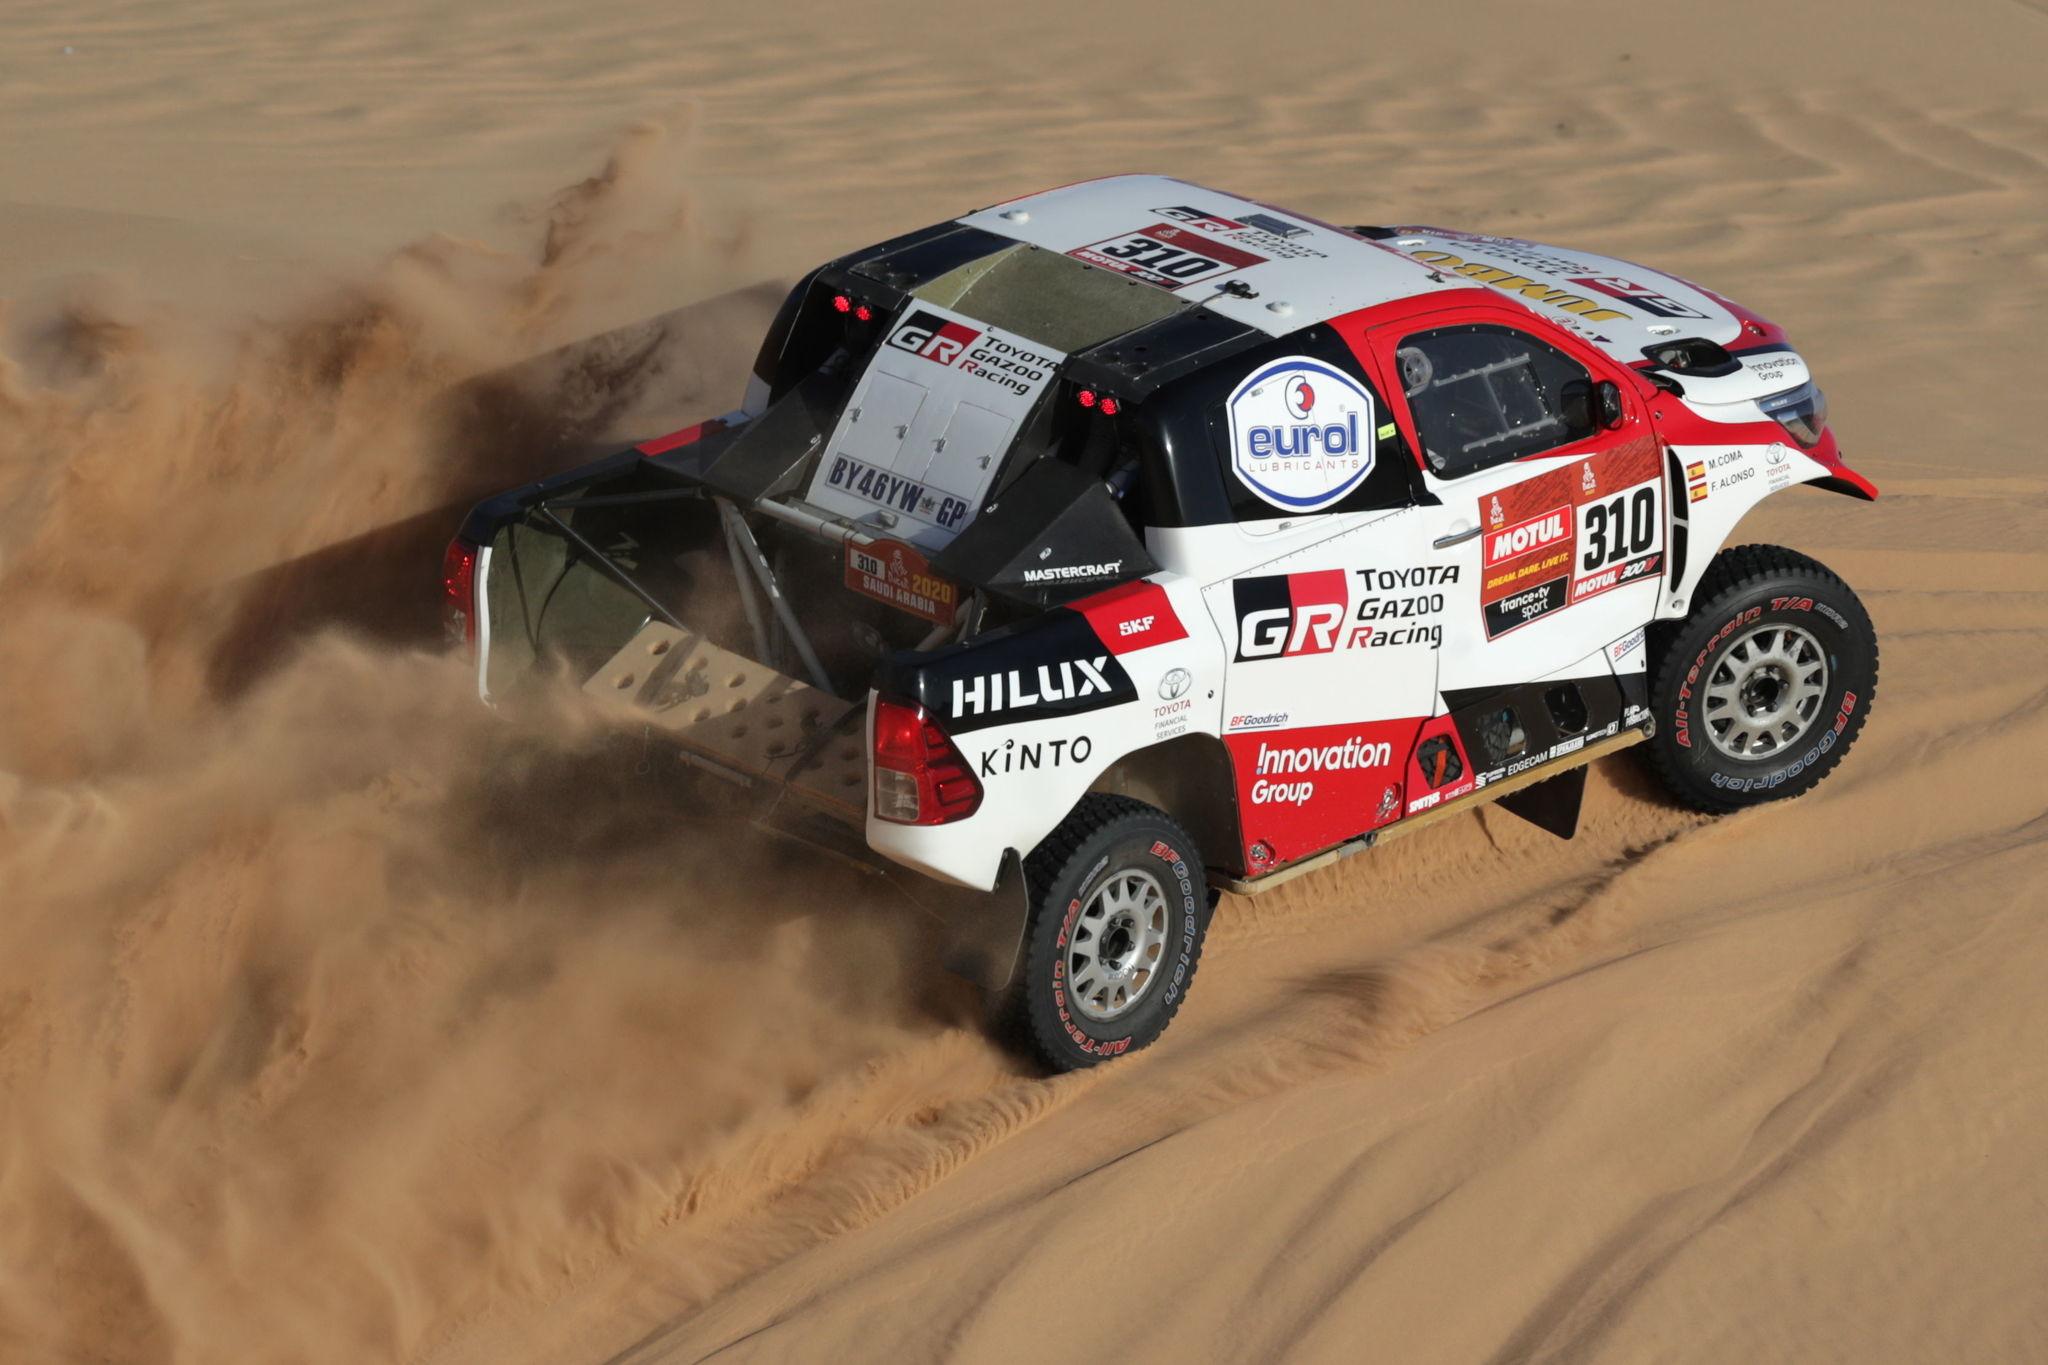 Wadi Al-dawasir (Saudi Arabia).- <HIT>Fernando</HIT> <HIT>Alonso</HIT> of Spain (Toyota Gaozo Racing) in action during stage eight of the Rally Dakar 2020 in Wadi Al-Dawasir, Saudi Arabia, 13 January 2020. (Arabia Saudita, España) EPA/